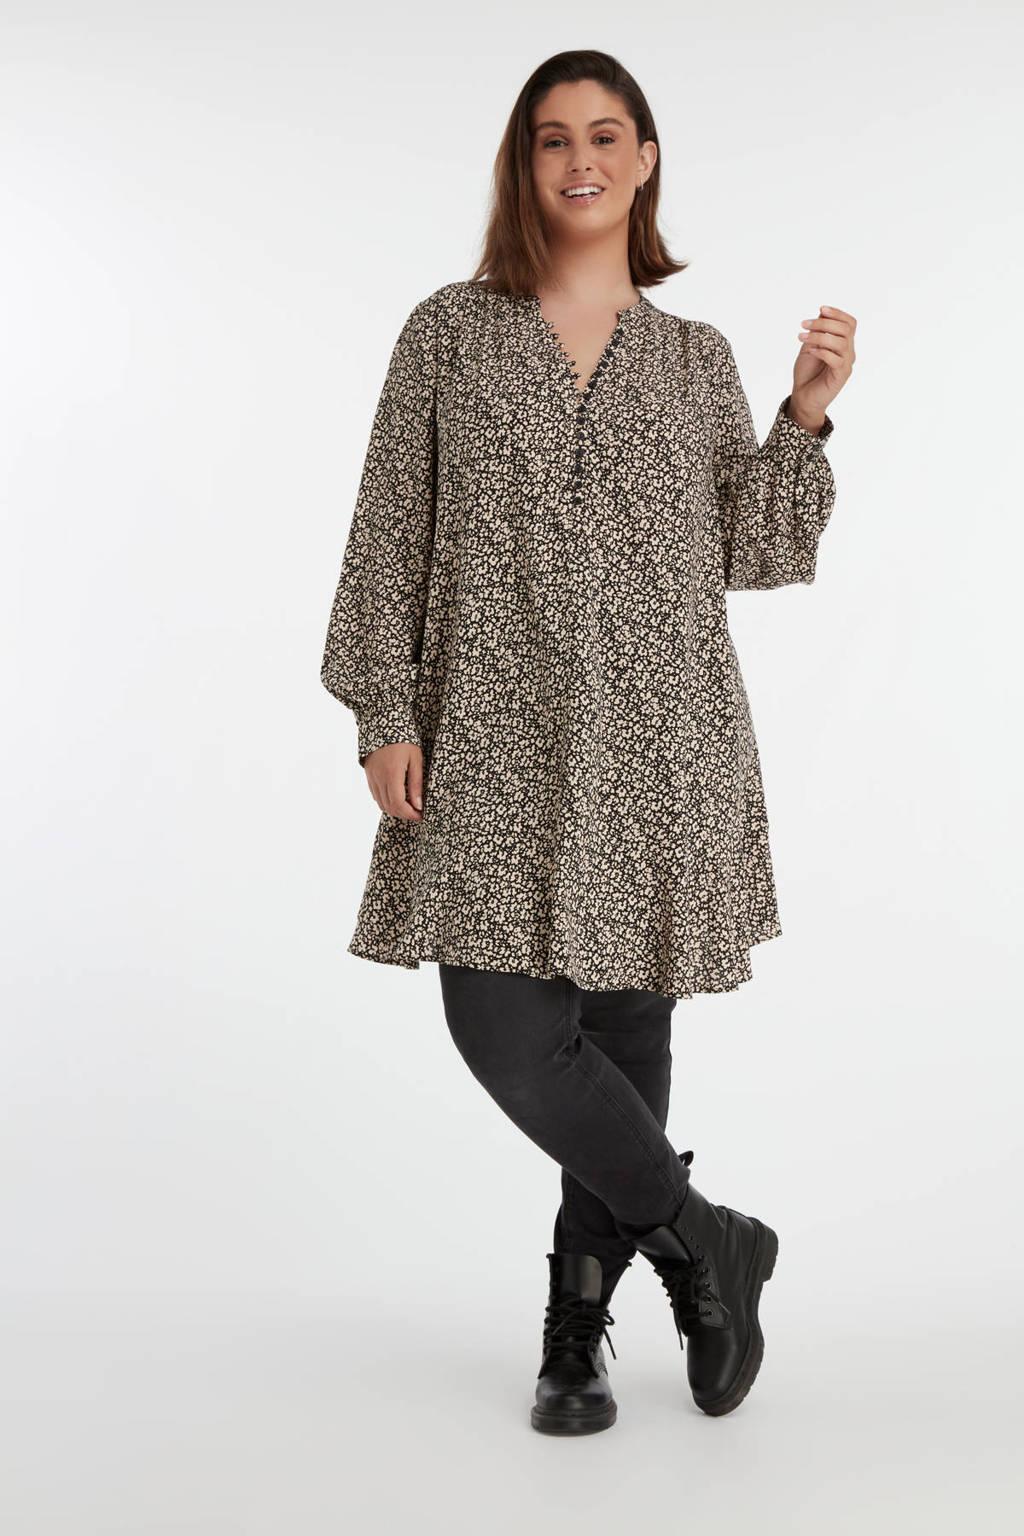 MS Mode blouse met all over print en plooien zwart/zand, Zwart/zand